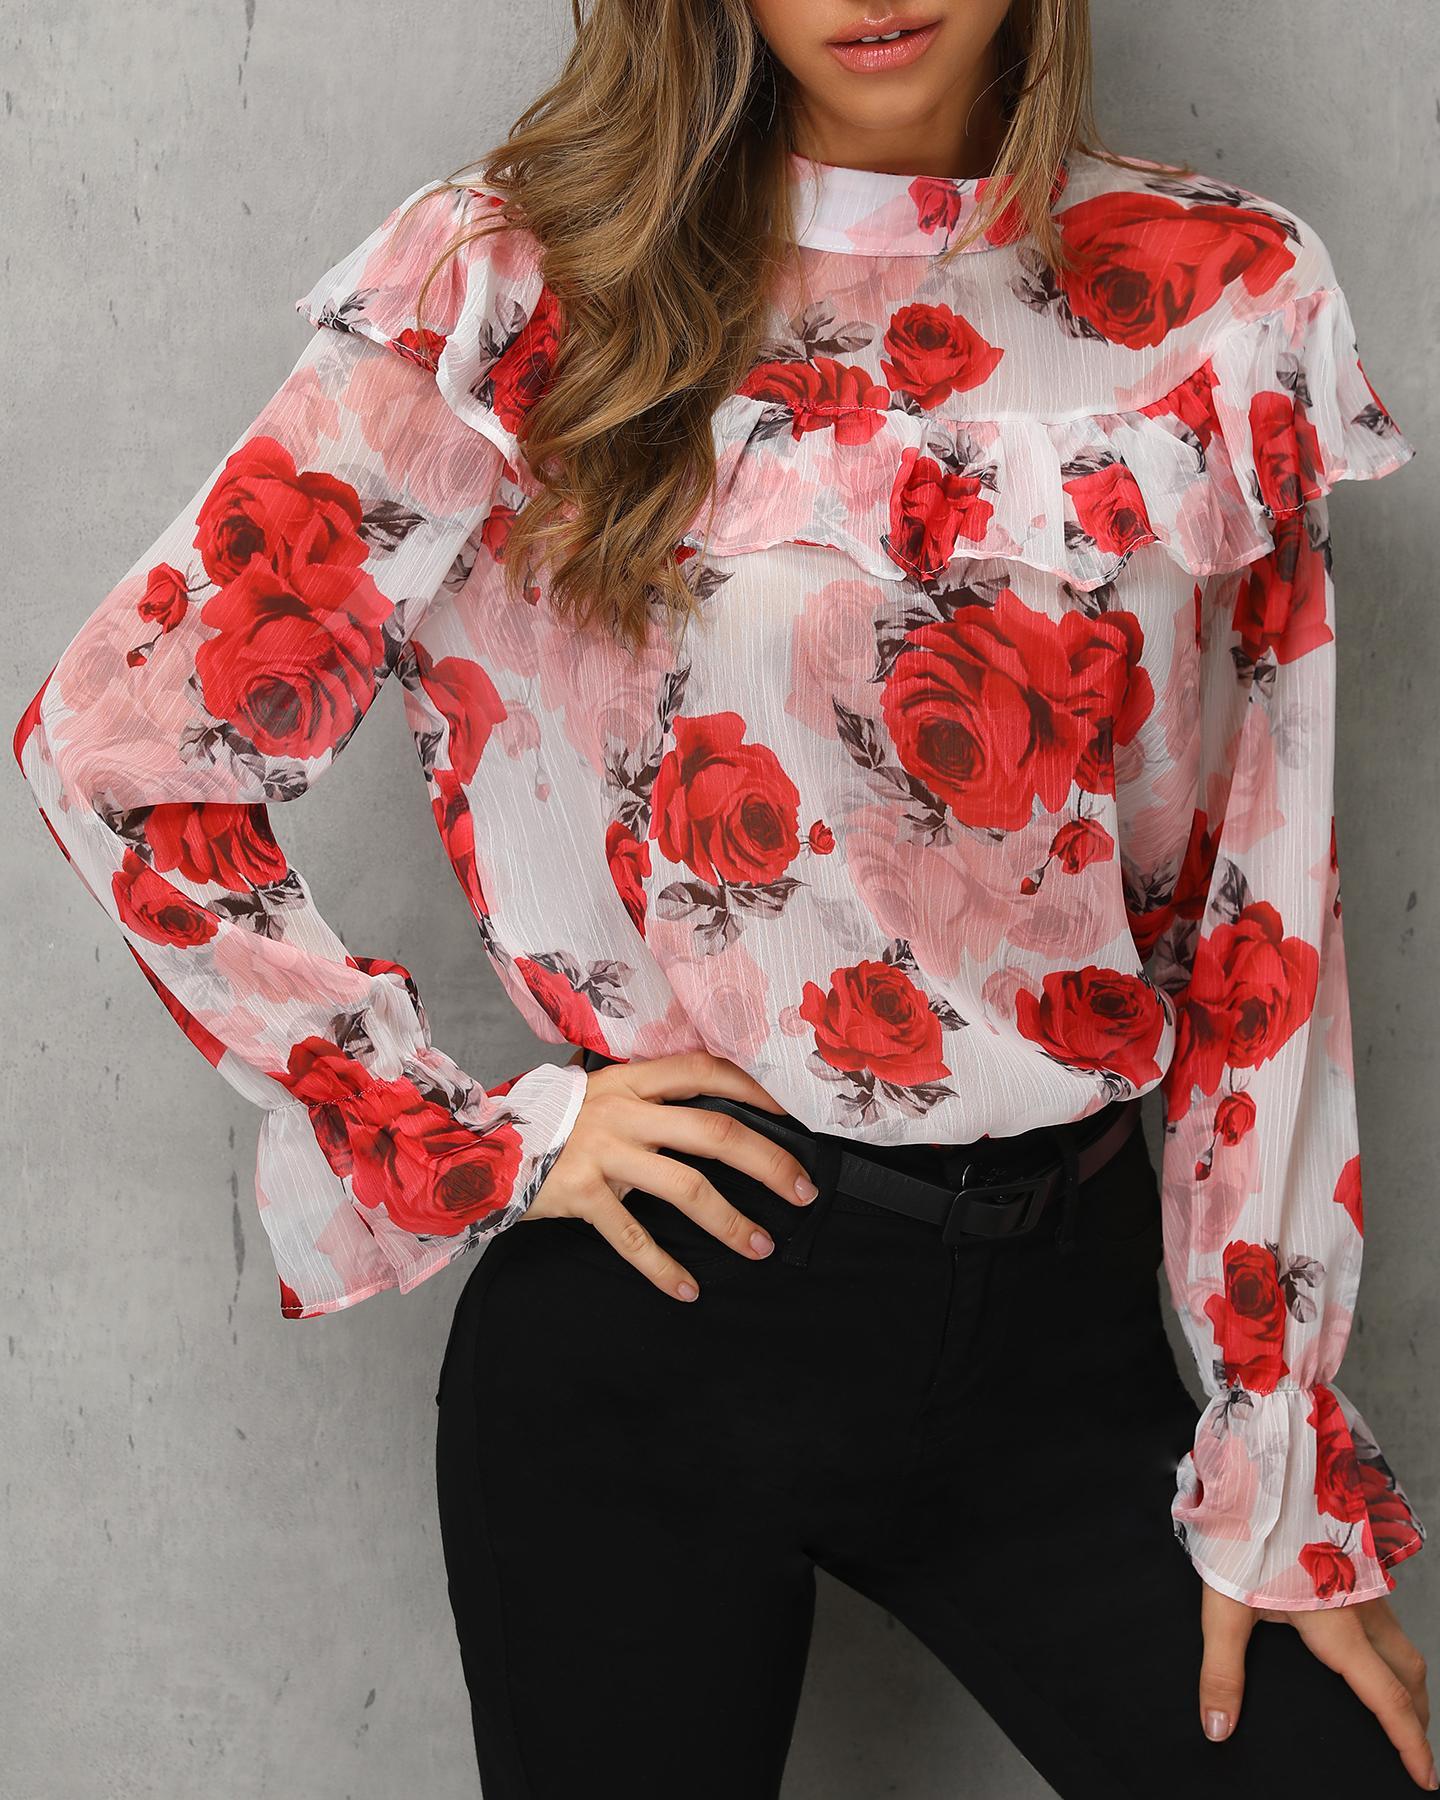 Floral Print Ruffles Casual Blouse